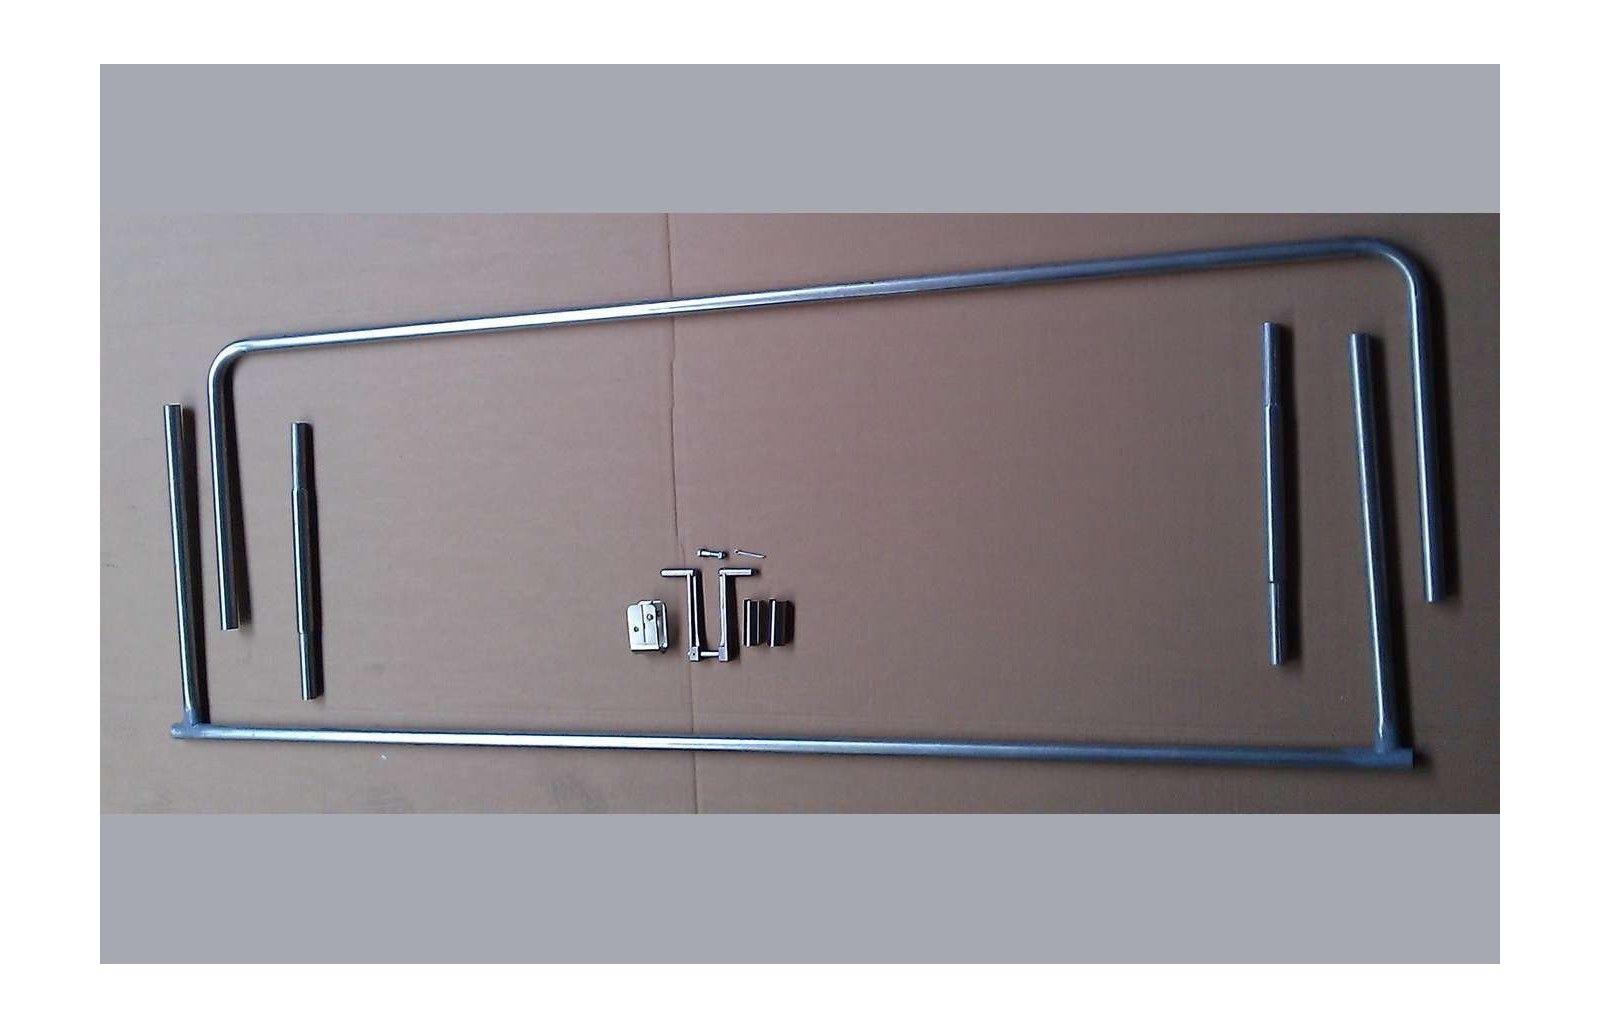 cadre de porte kit poignee serre super serres tonneau. Black Bedroom Furniture Sets. Home Design Ideas